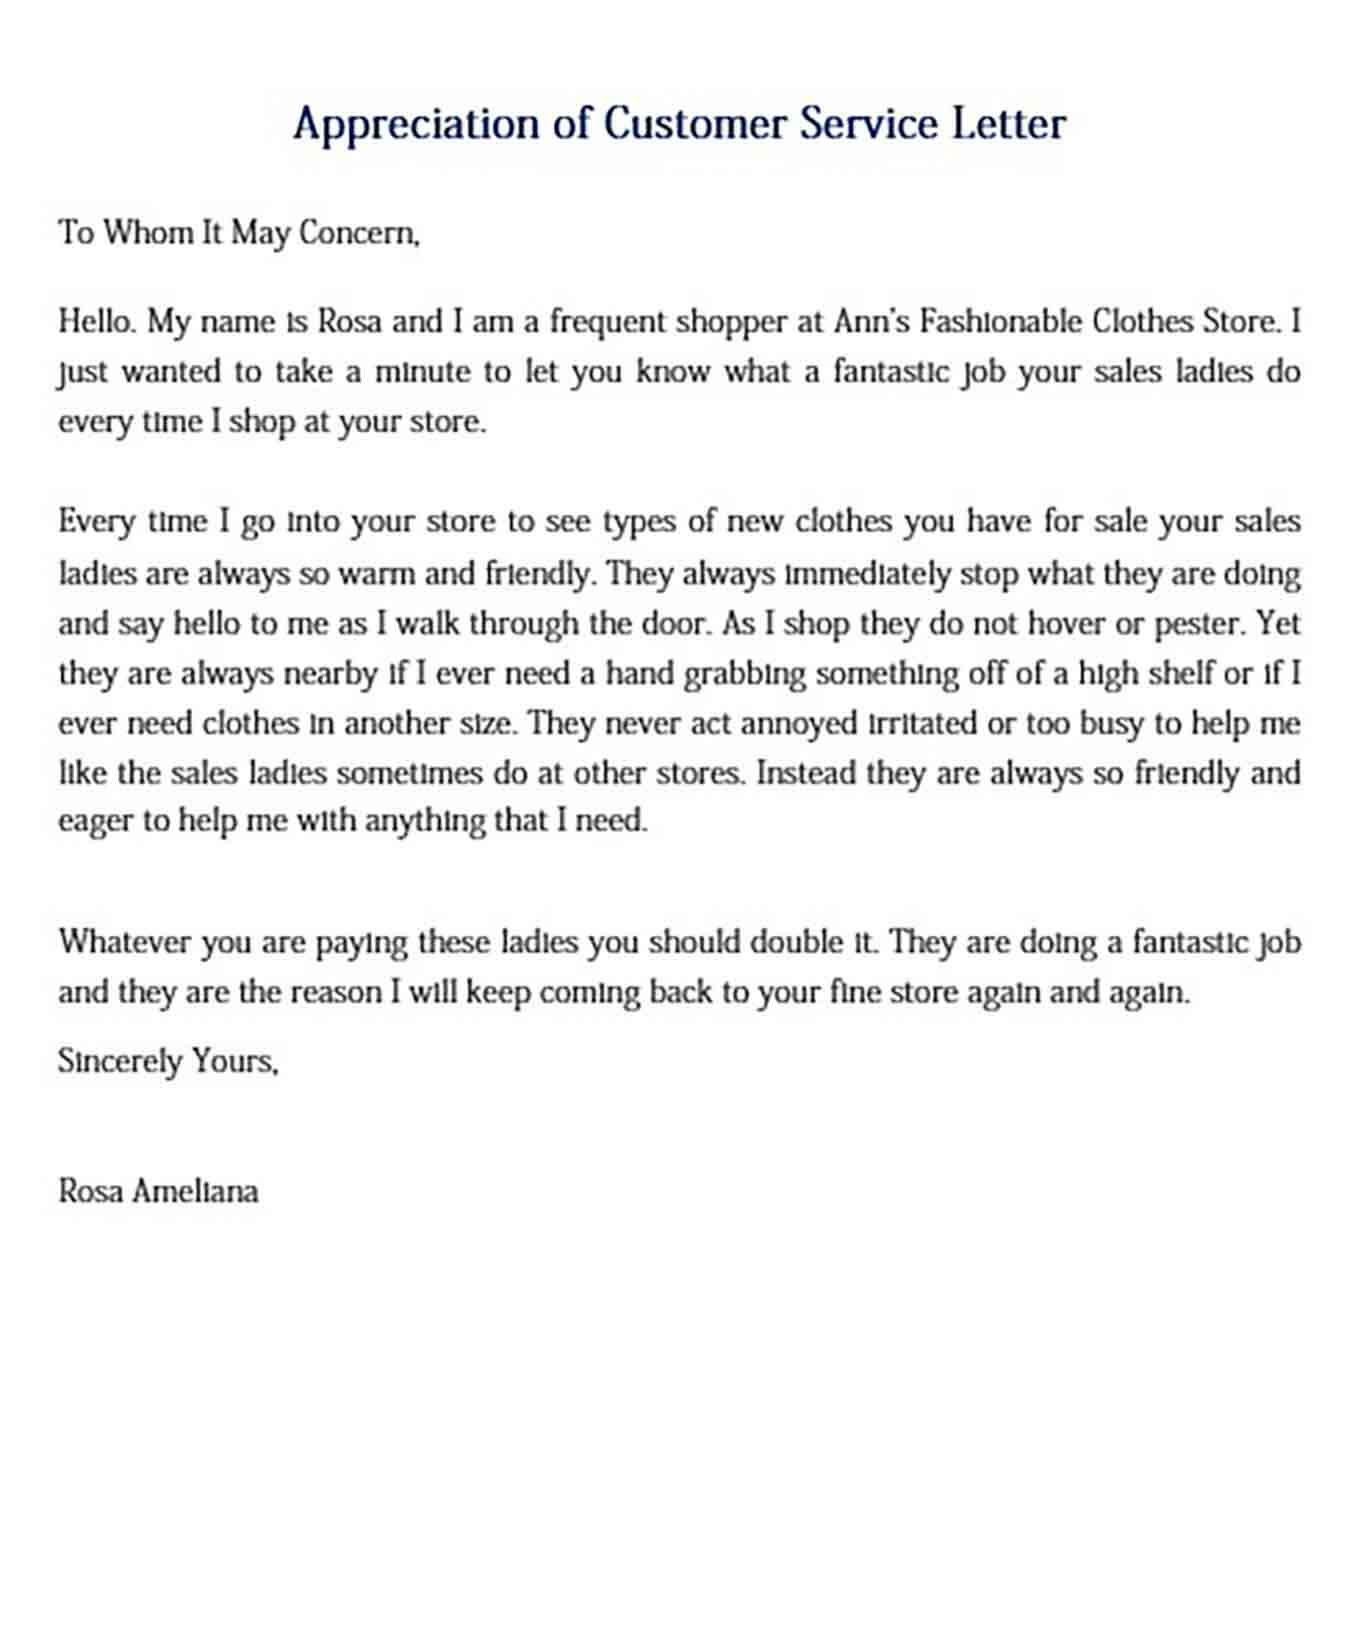 Appreciation of Customer Service Letter